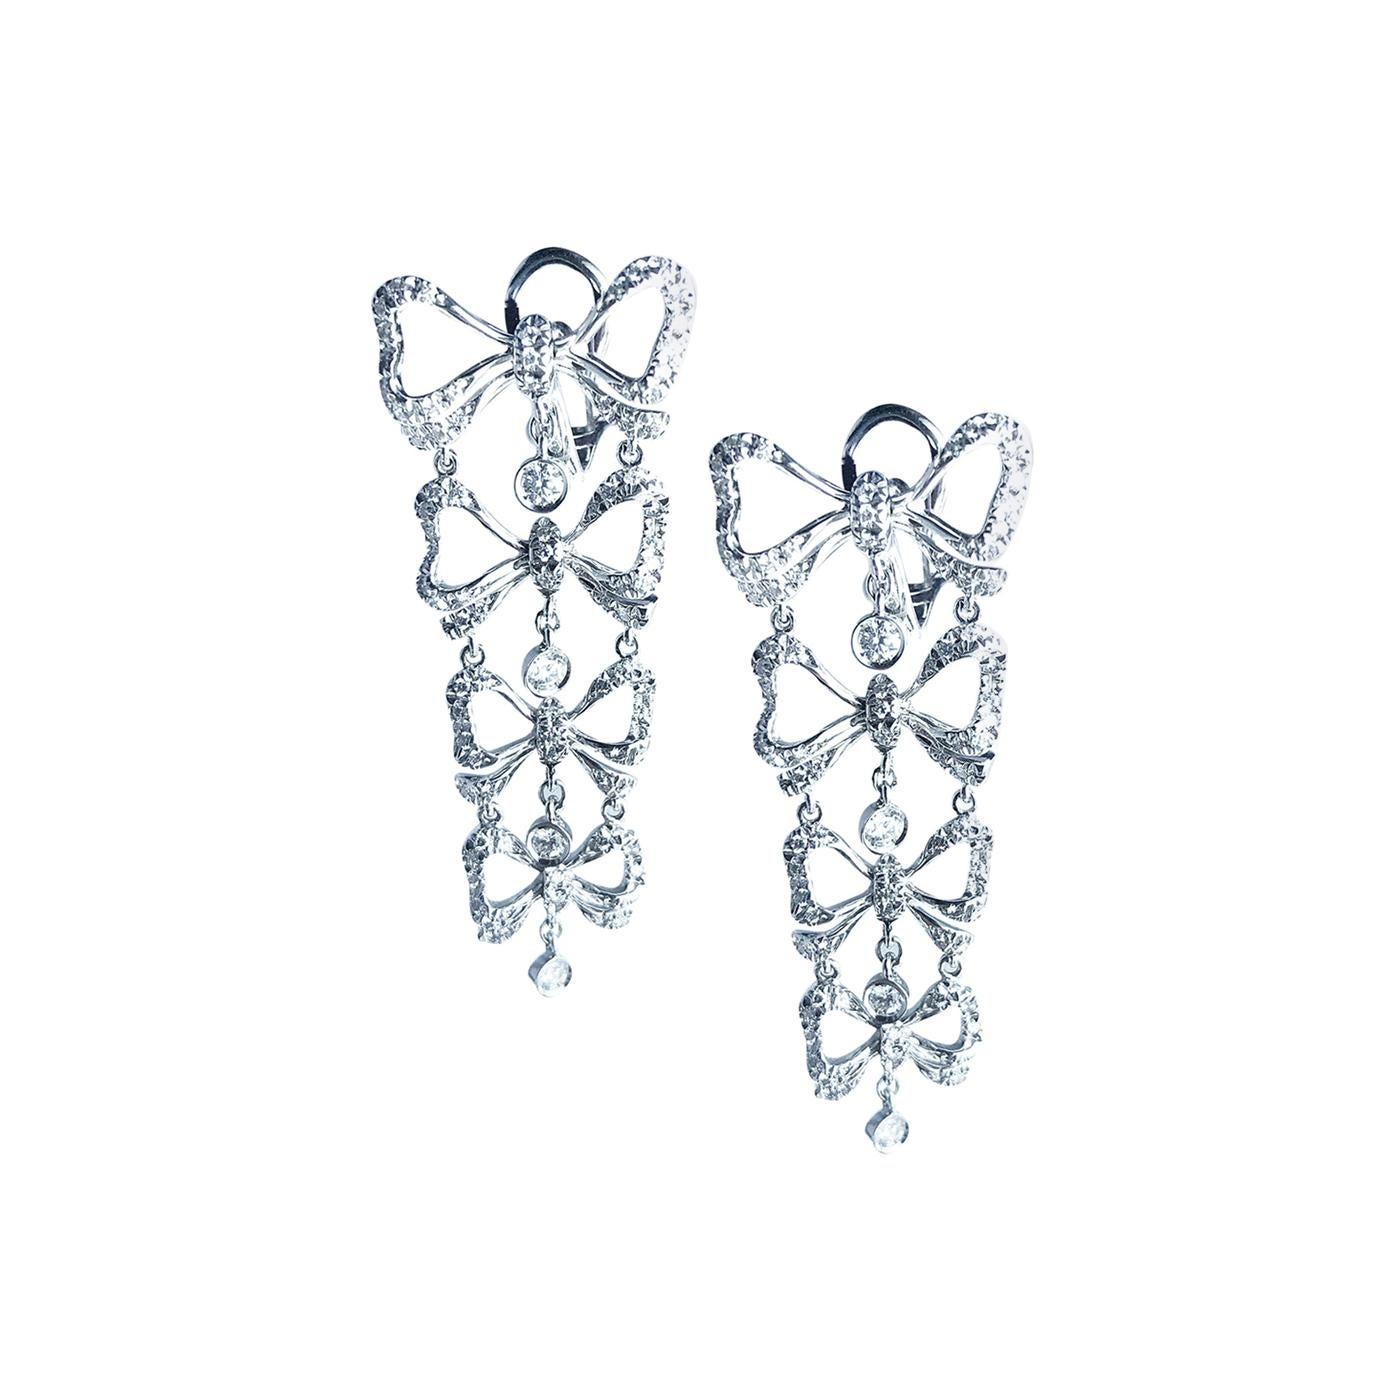 Stefan Hafner 1.52 Carat Diamond Birthday Bow Dangling Earrings